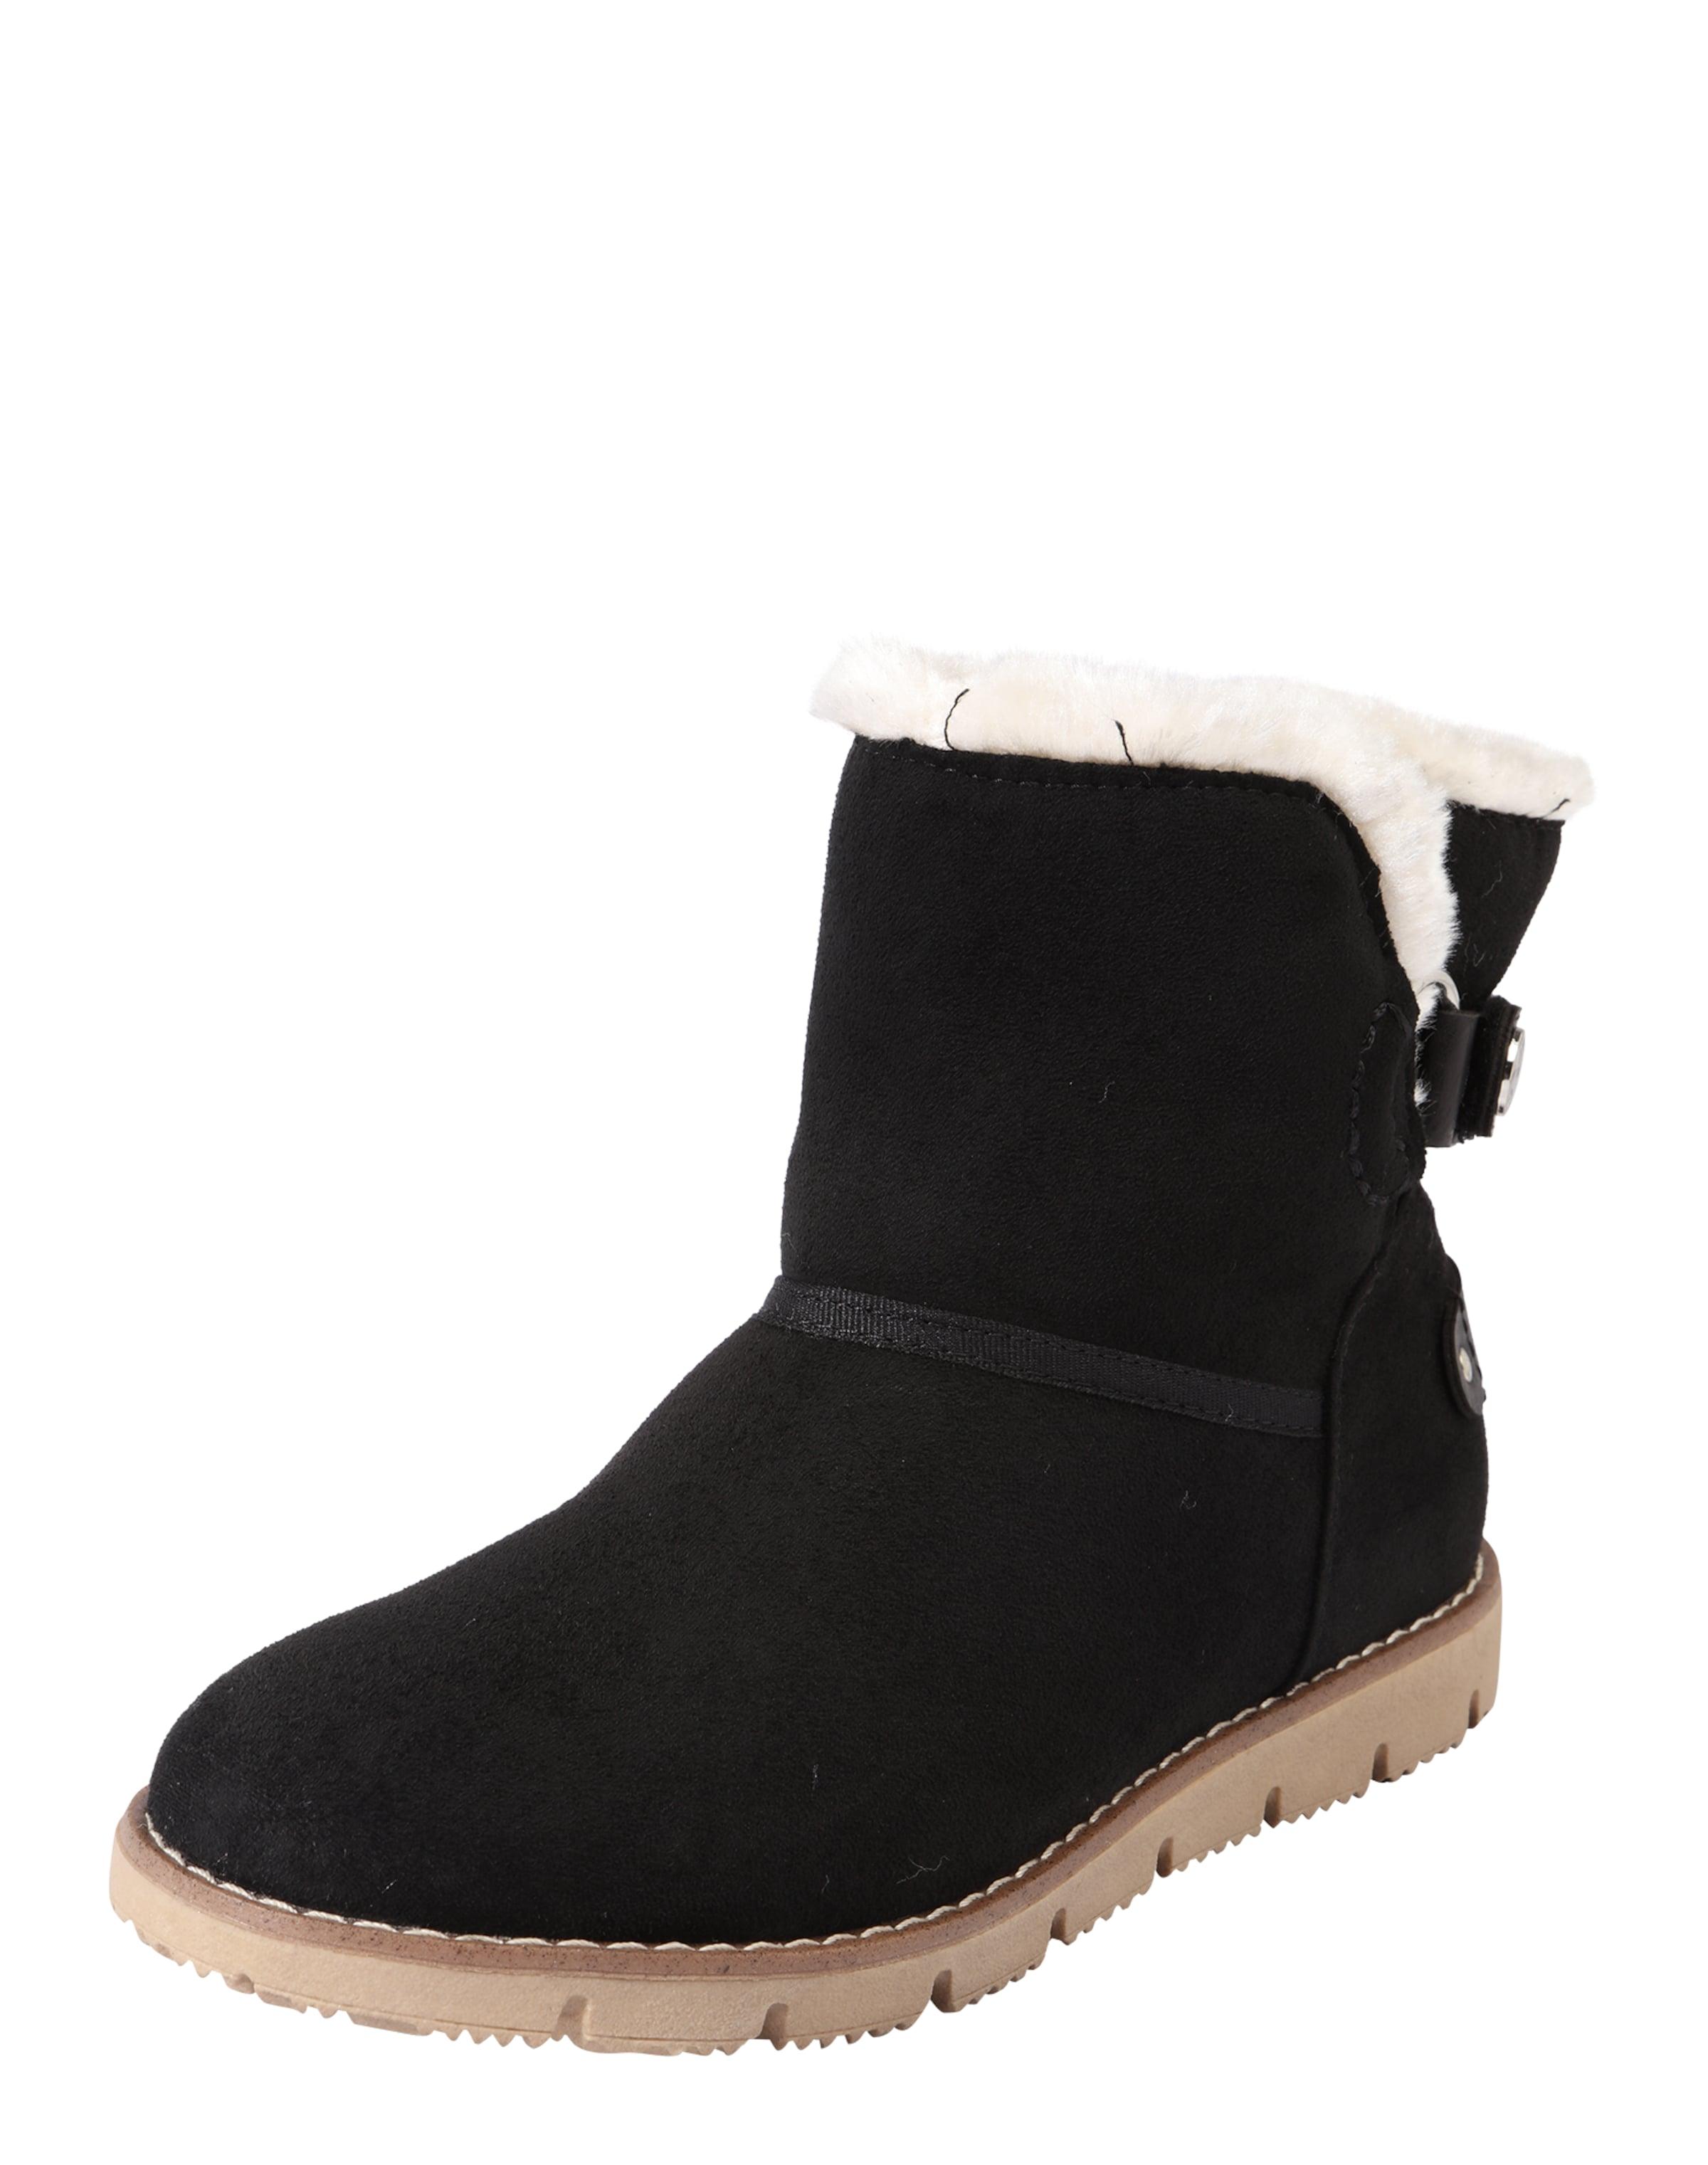 TOM TAILOR | Snowboot mit Webfell-Futter Schuhe Gut getragene getragene getragene Schuhe 40de88